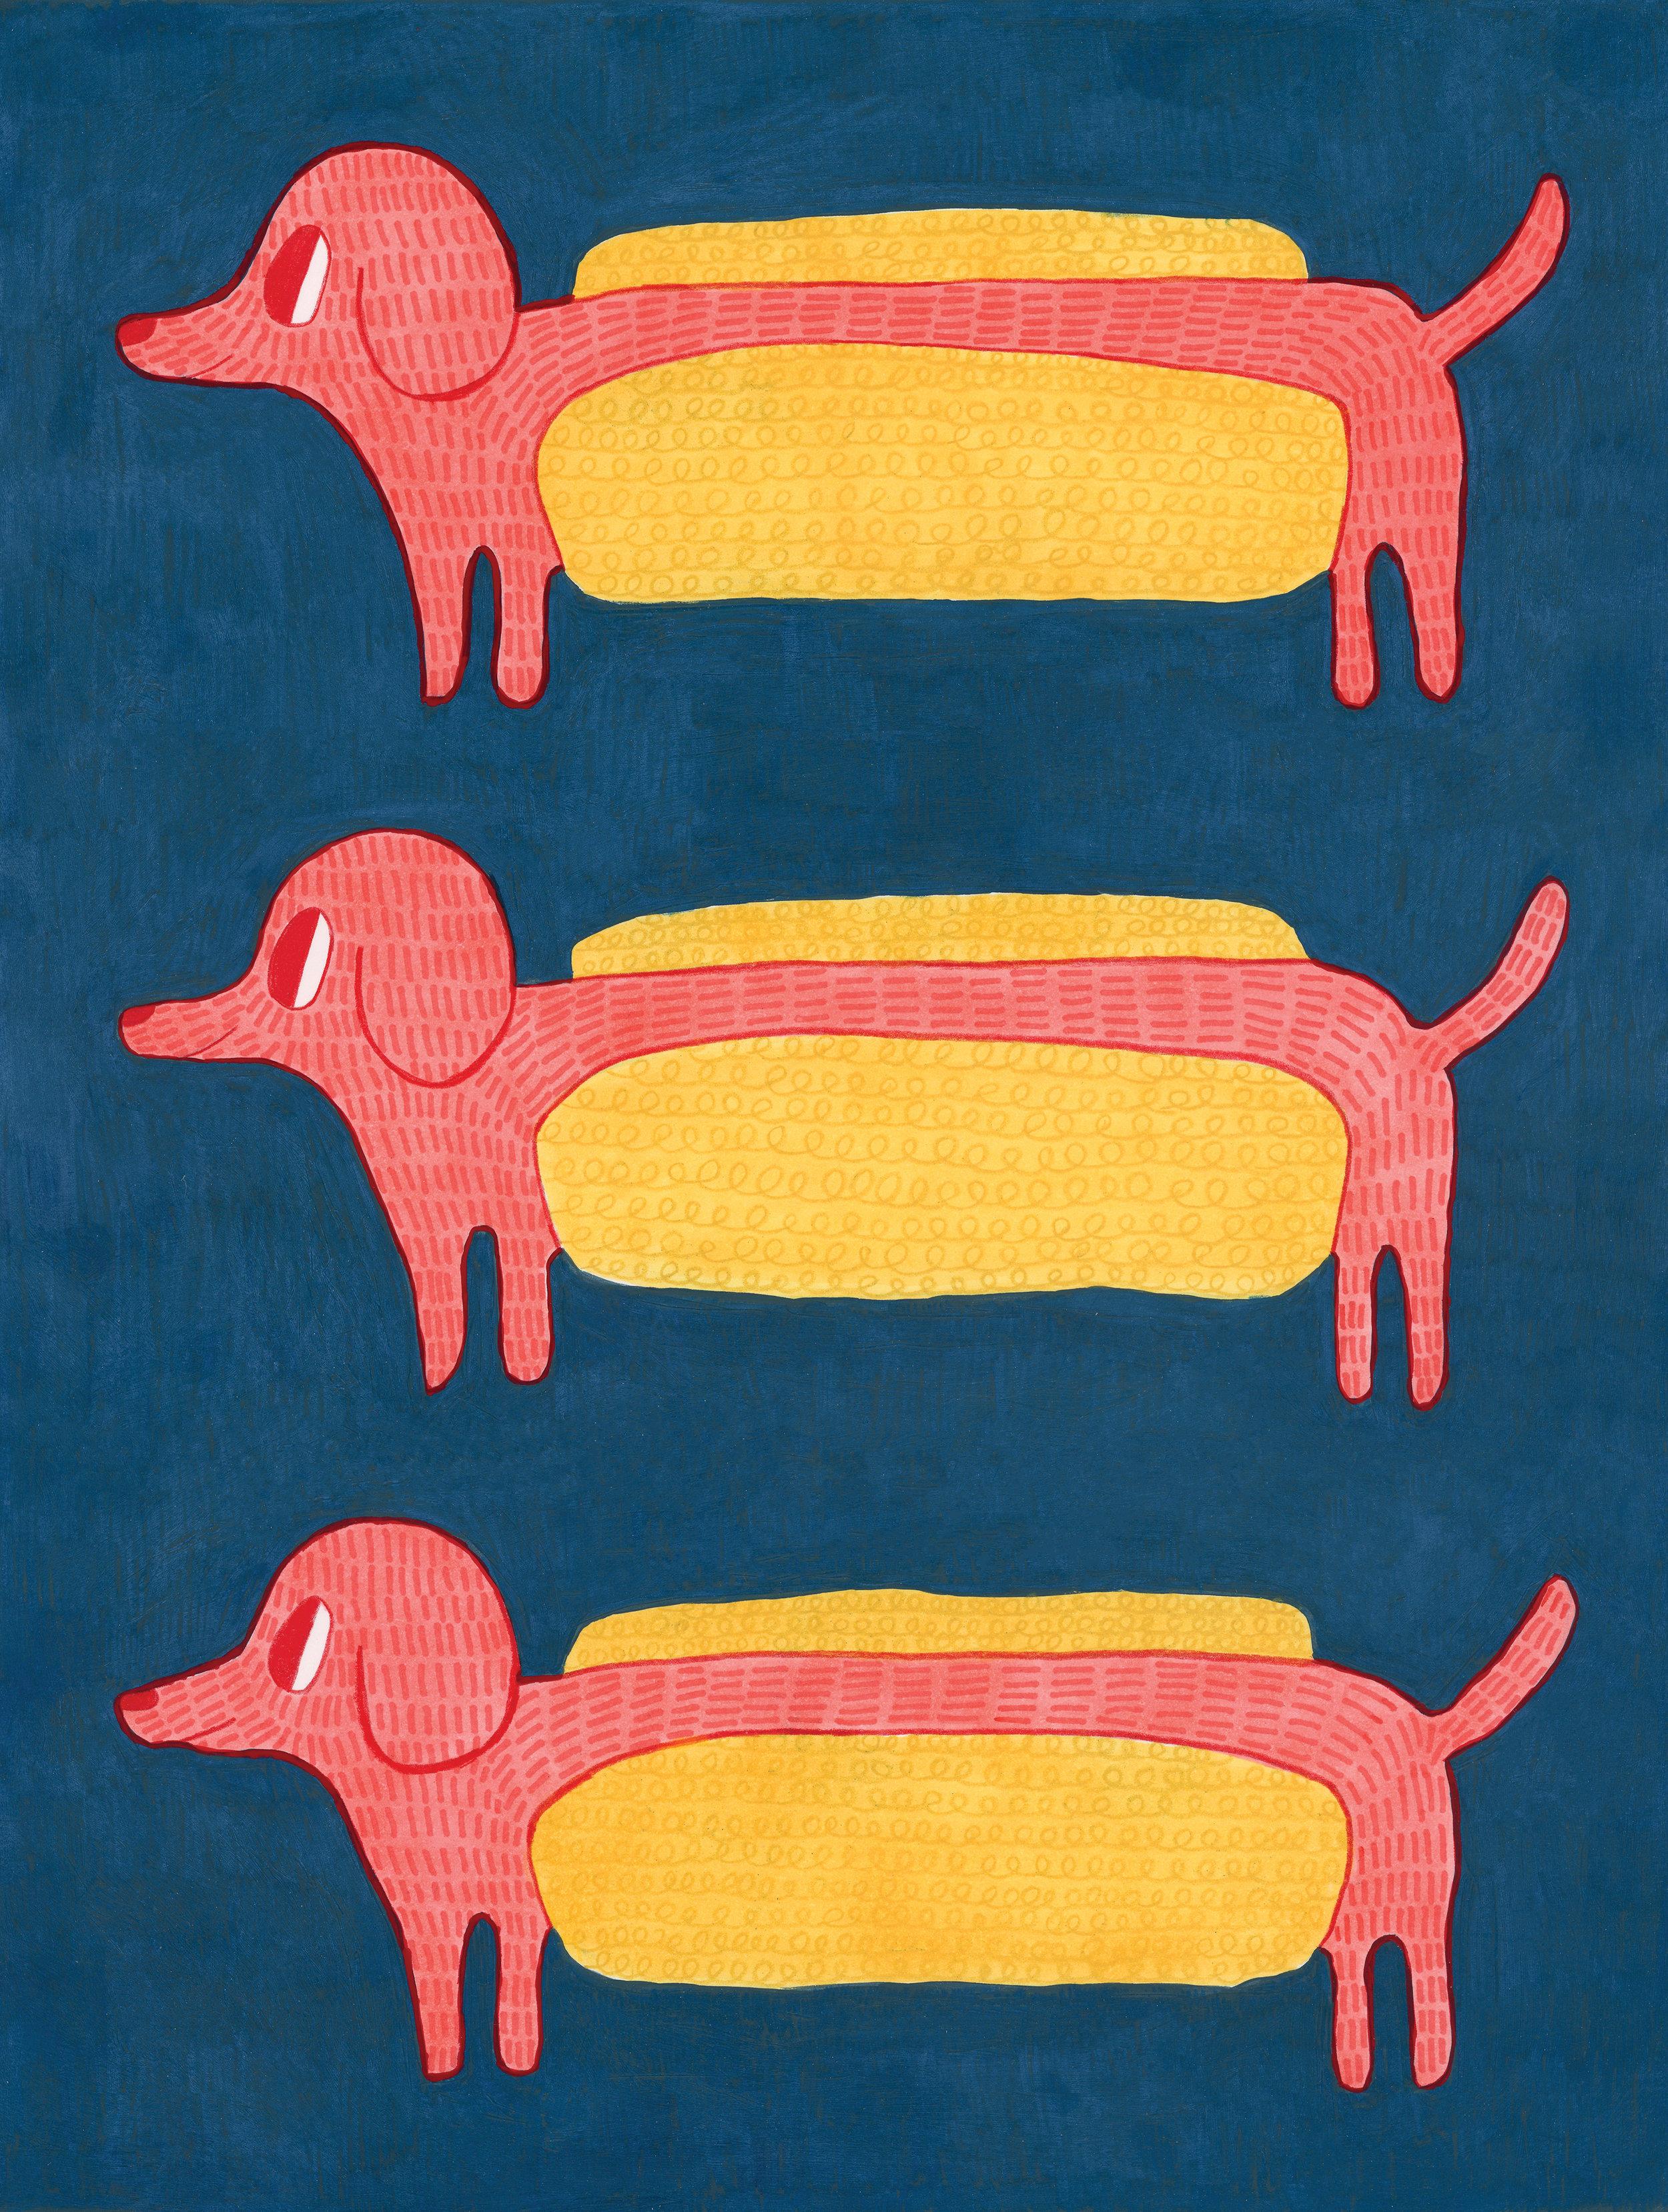 hot dog 72.jpg